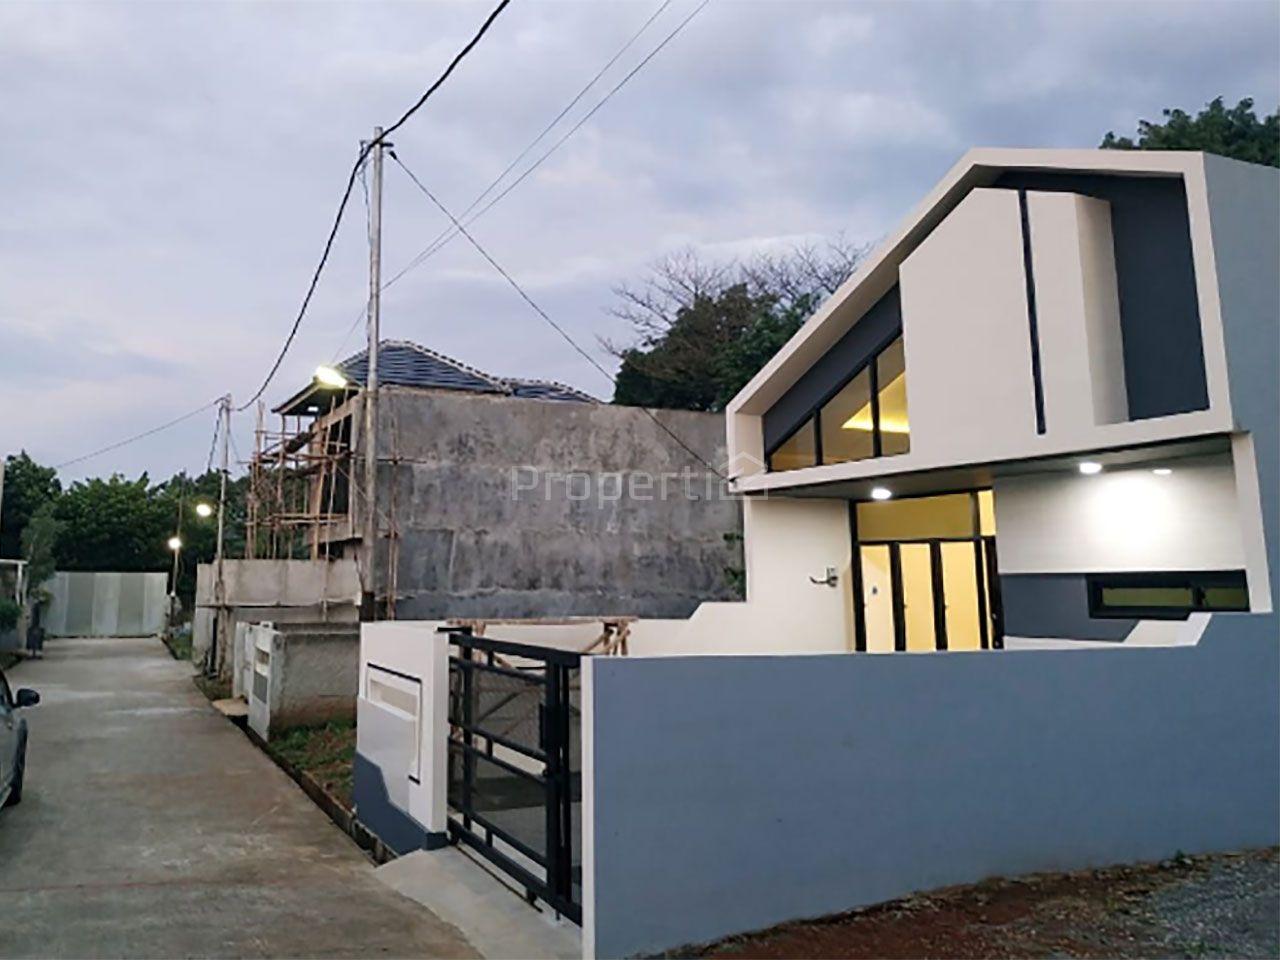 Rumah Cluster di Sawangan, Kota Depok, Jawa Barat